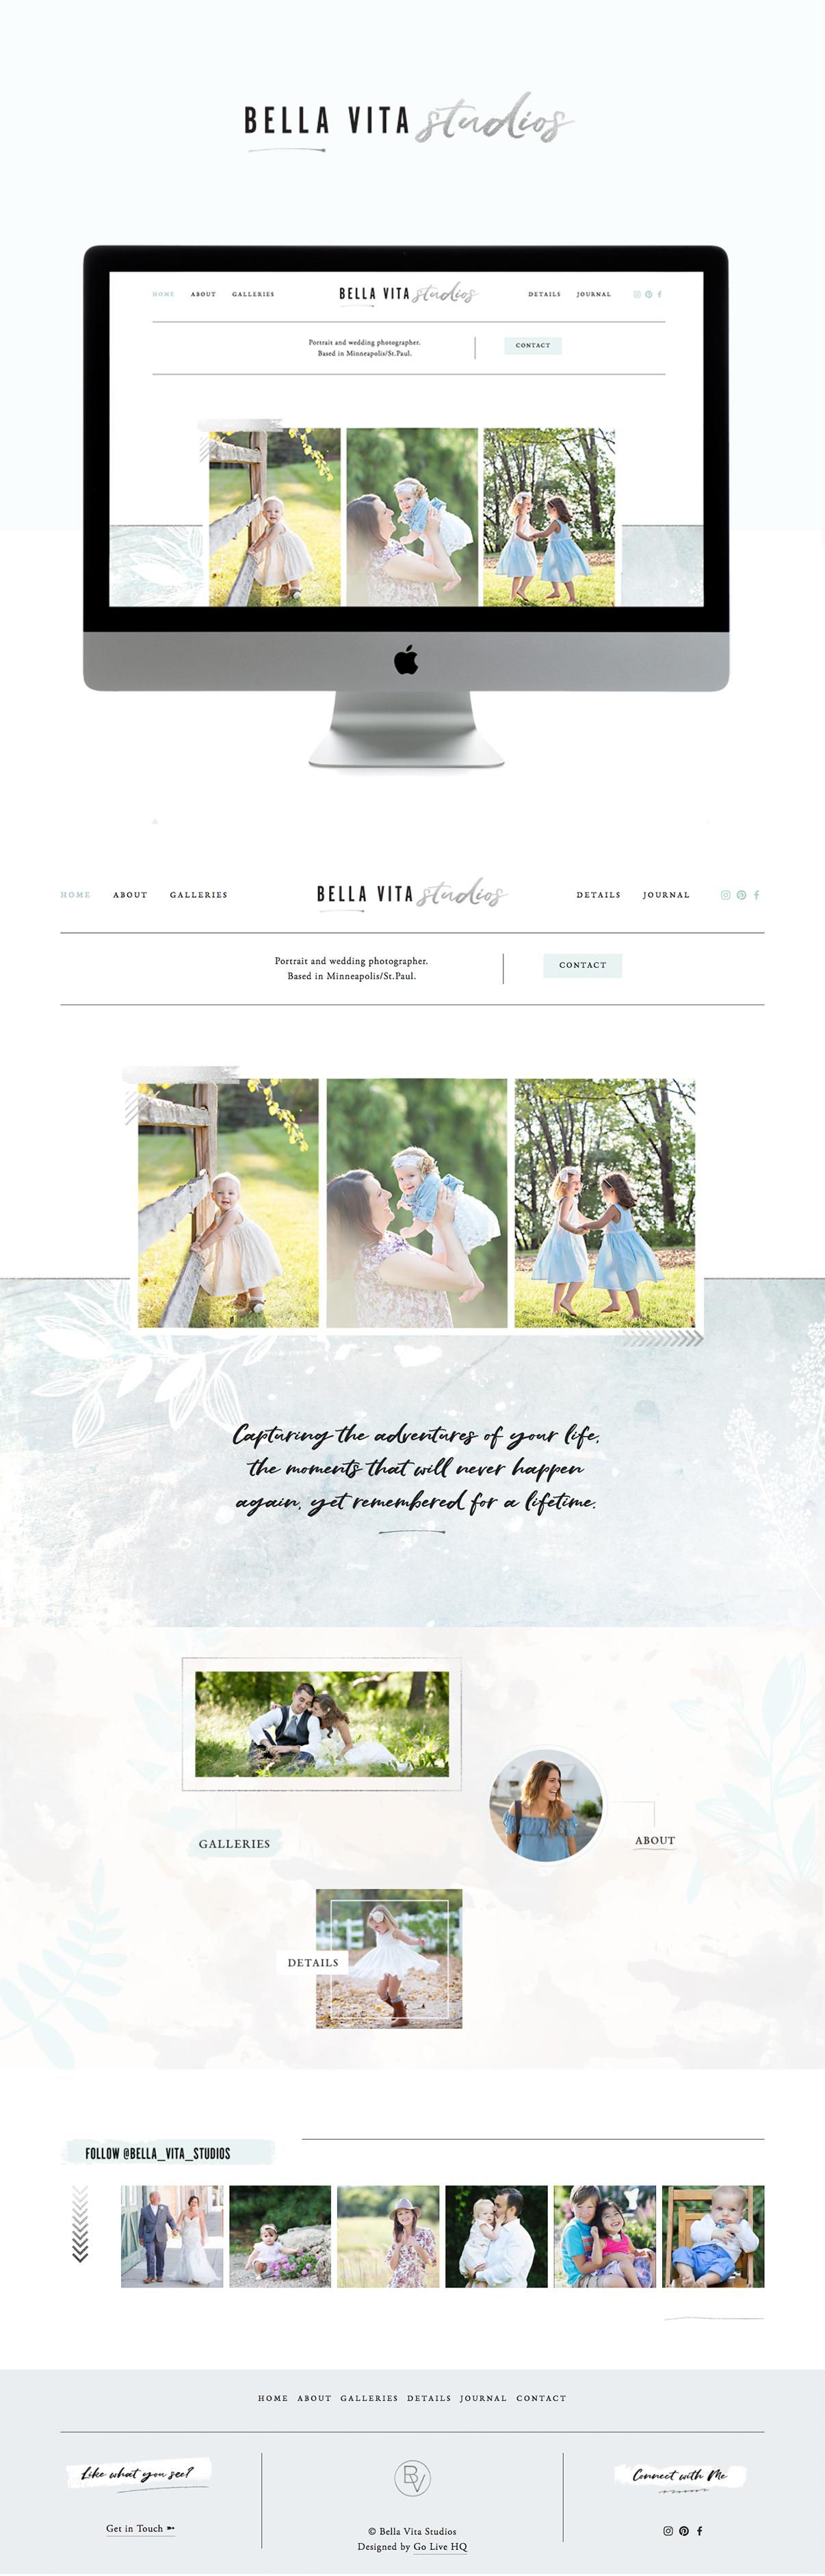 free people website inspiration | Go Live Hq